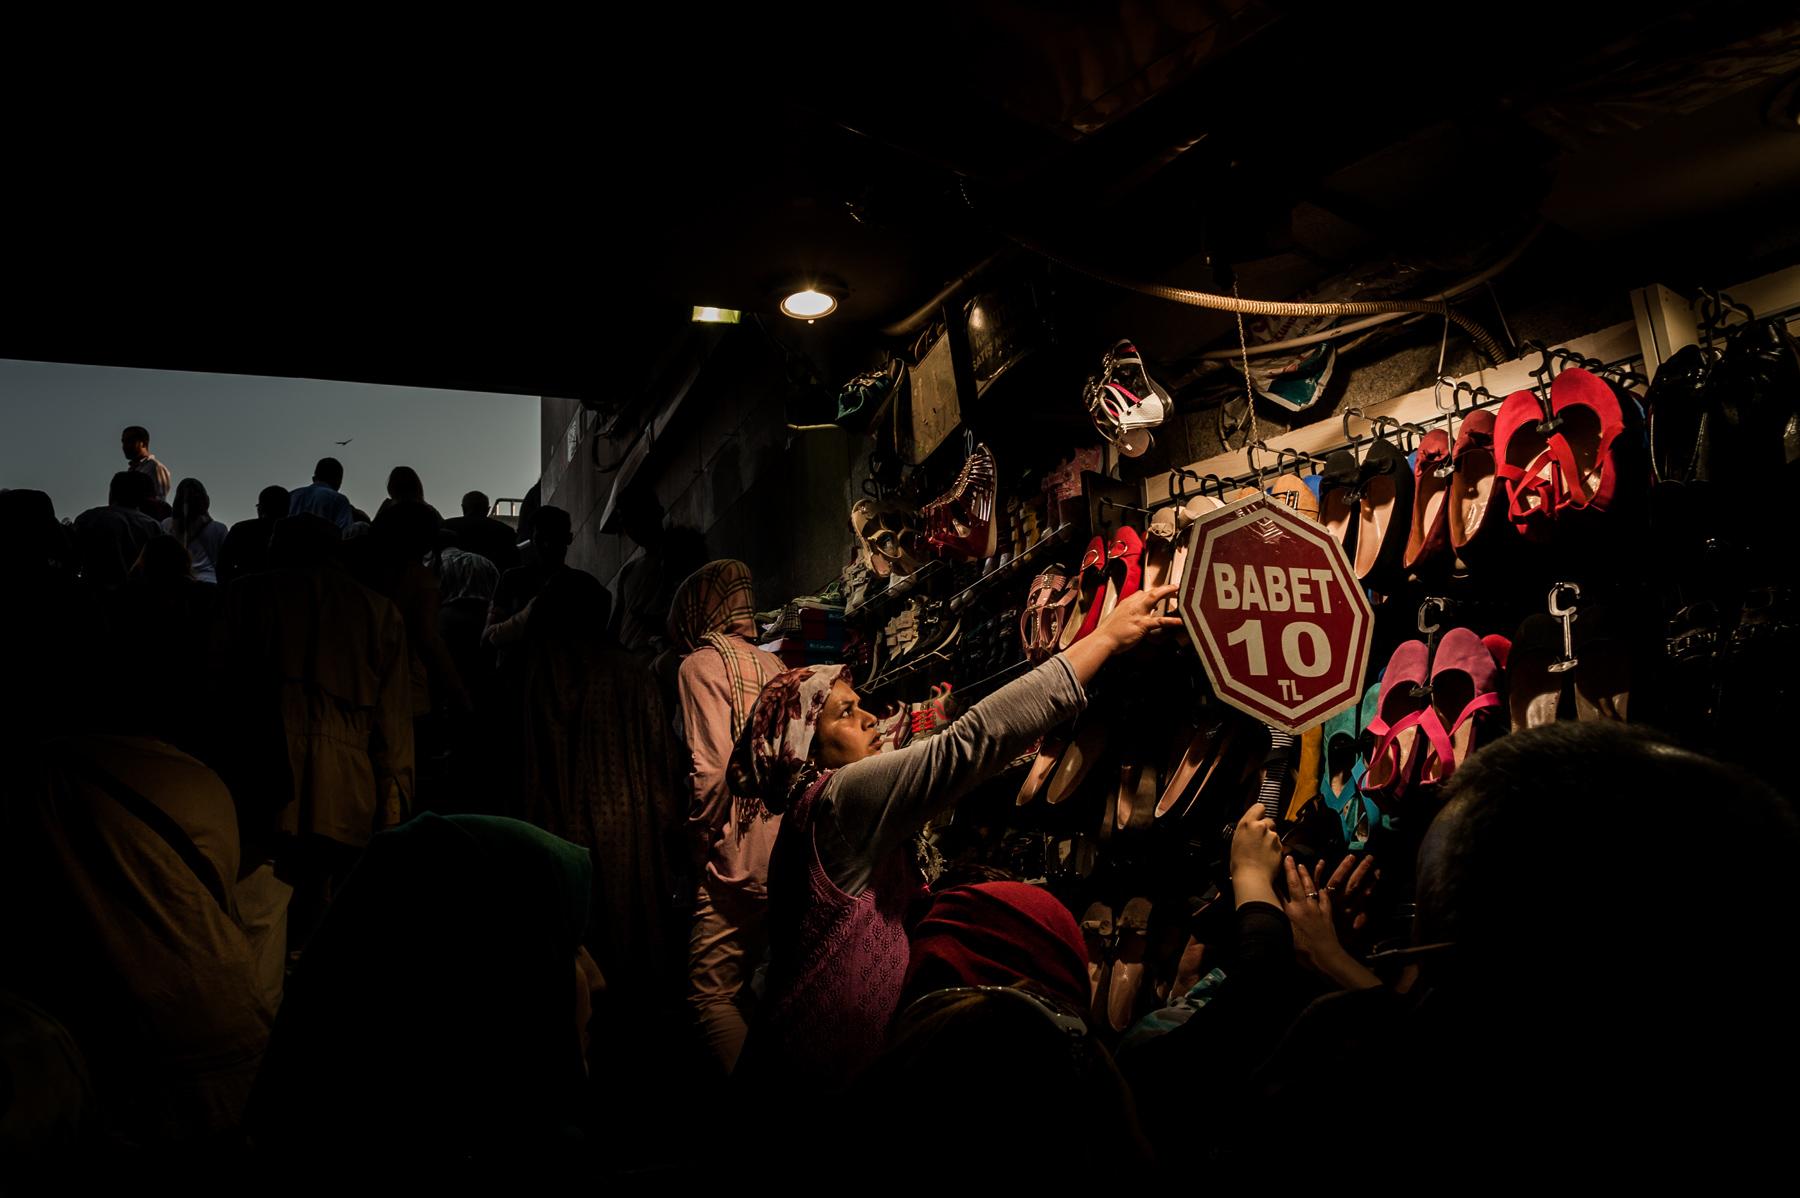 Turkey_tunnel_bazaar_darklight.jpg